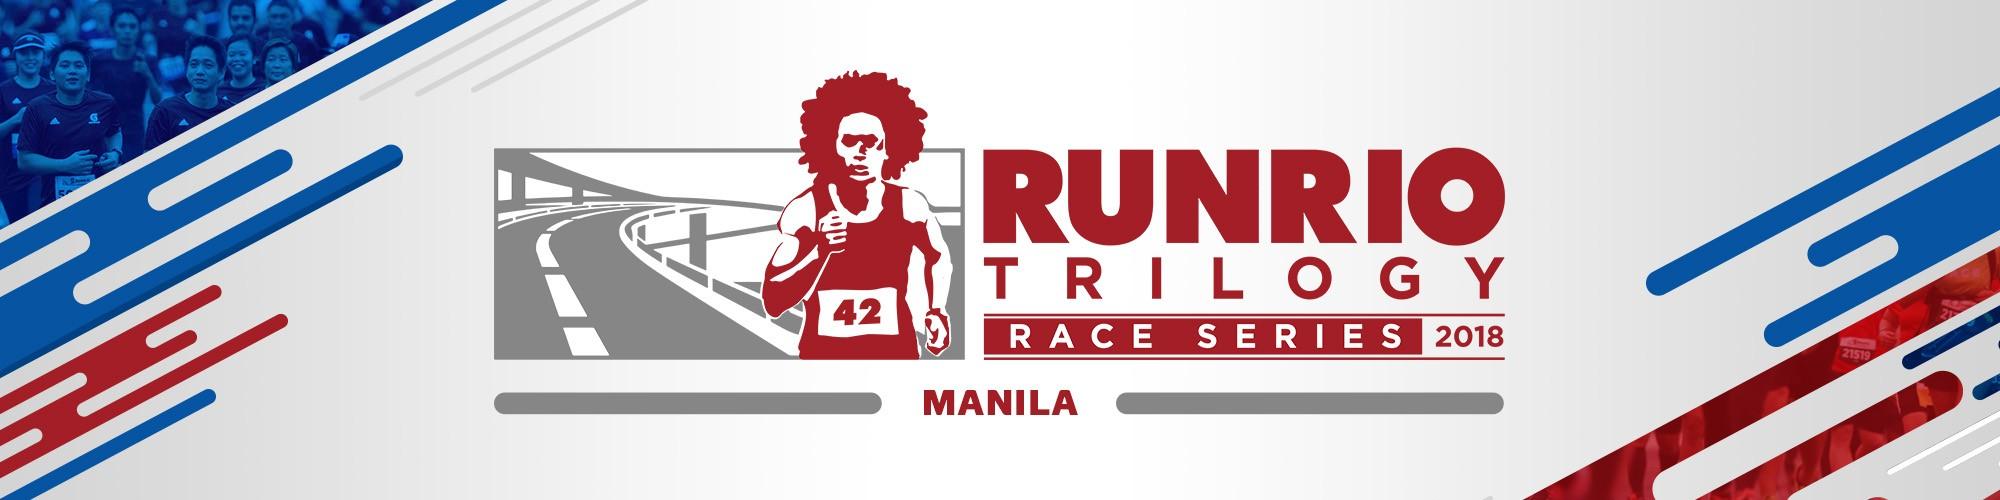 RUNRIO Trilogy Manila leg 2